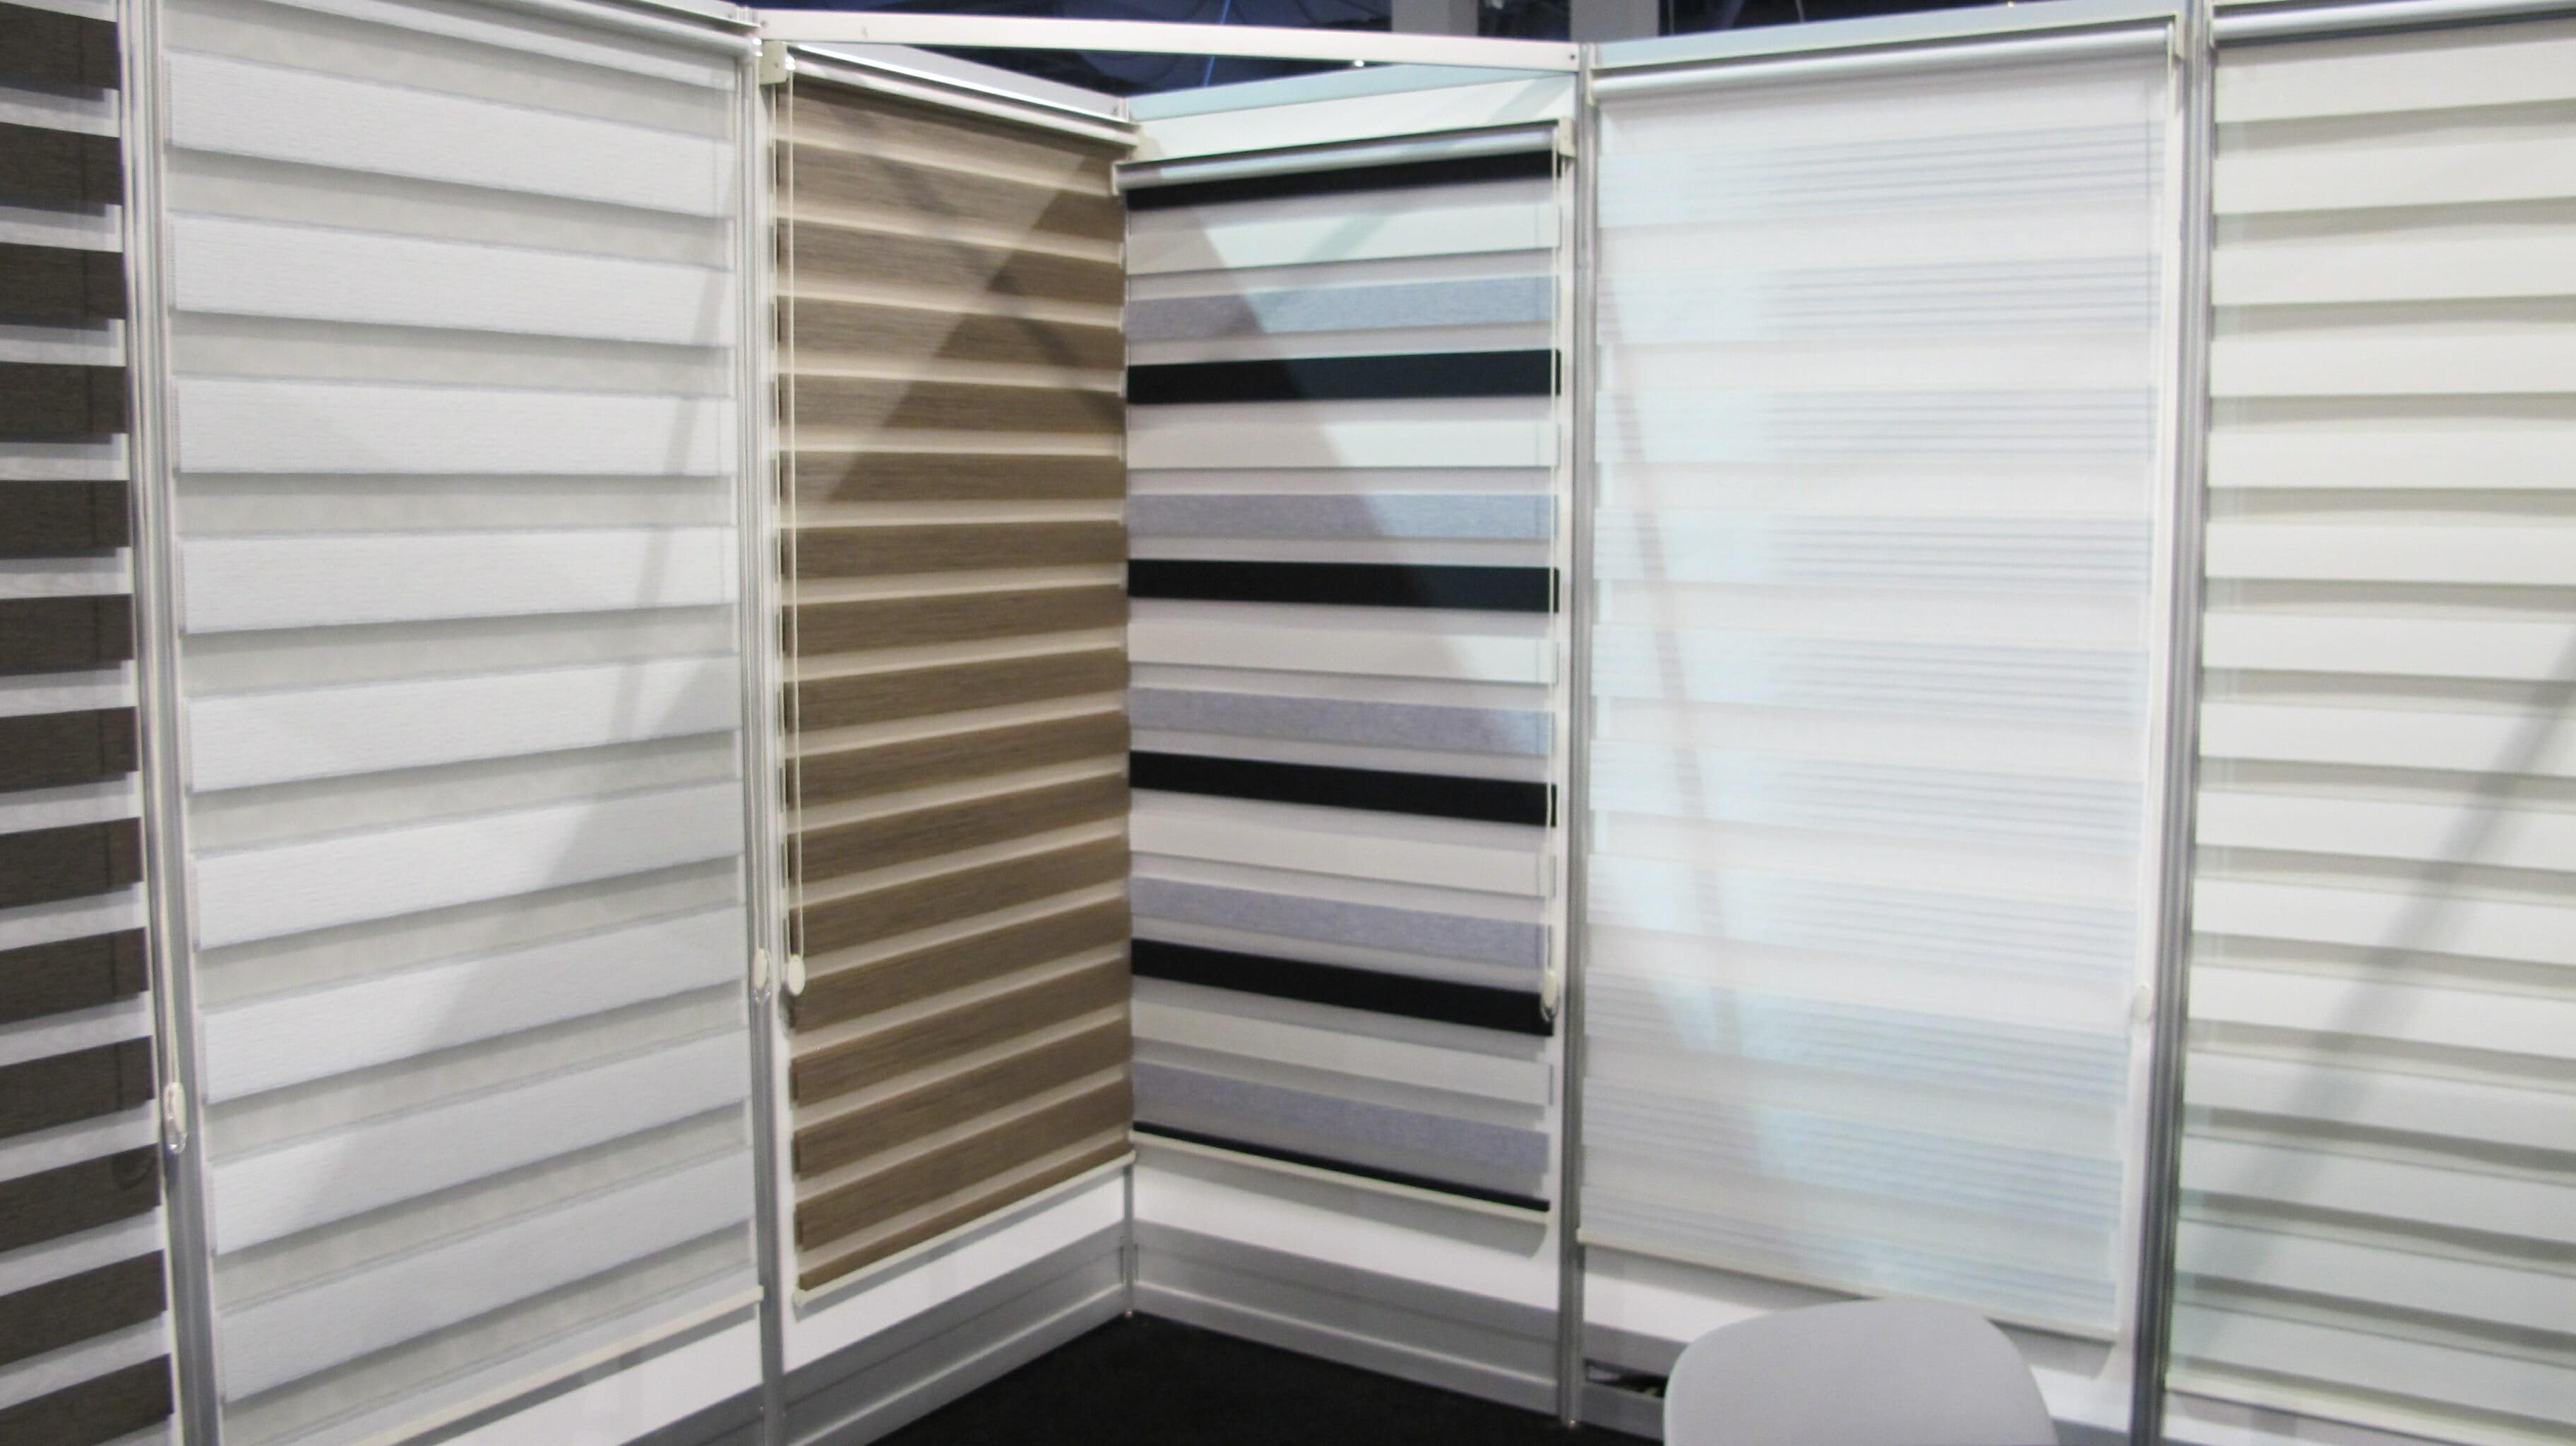 energy efficient window treatments: summer, winter & all season